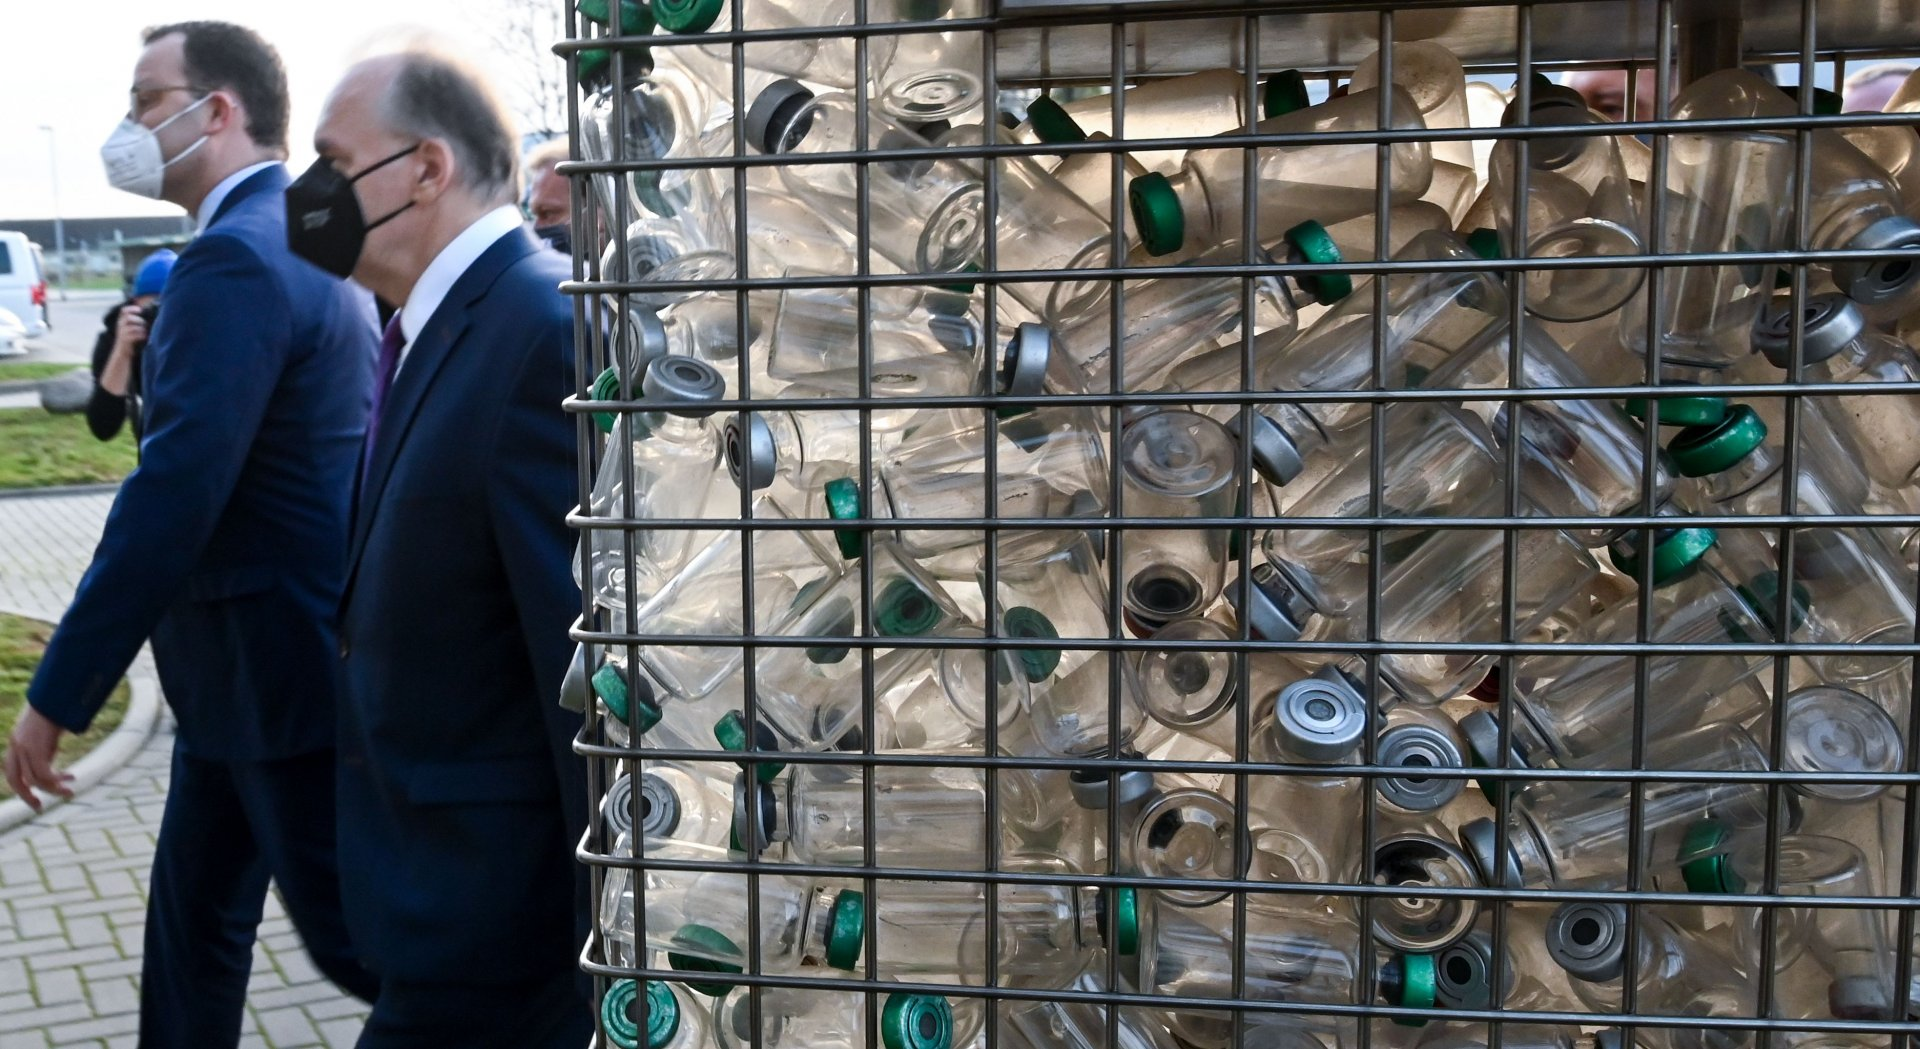 Mandatory Credit: Photo by HENDRIK SCHMIDT/POOL/EPA-EFE/Shutterstock (11030427u)German Minister of Health Jens Spahn (L) with Prime Minister of Saxony-Anhalt Reiner Haseloff (R) during a visit to the vaccine manufacturer IDT Biologika's plant in Dessau-Rosslau, Germany, 23 November 2020.